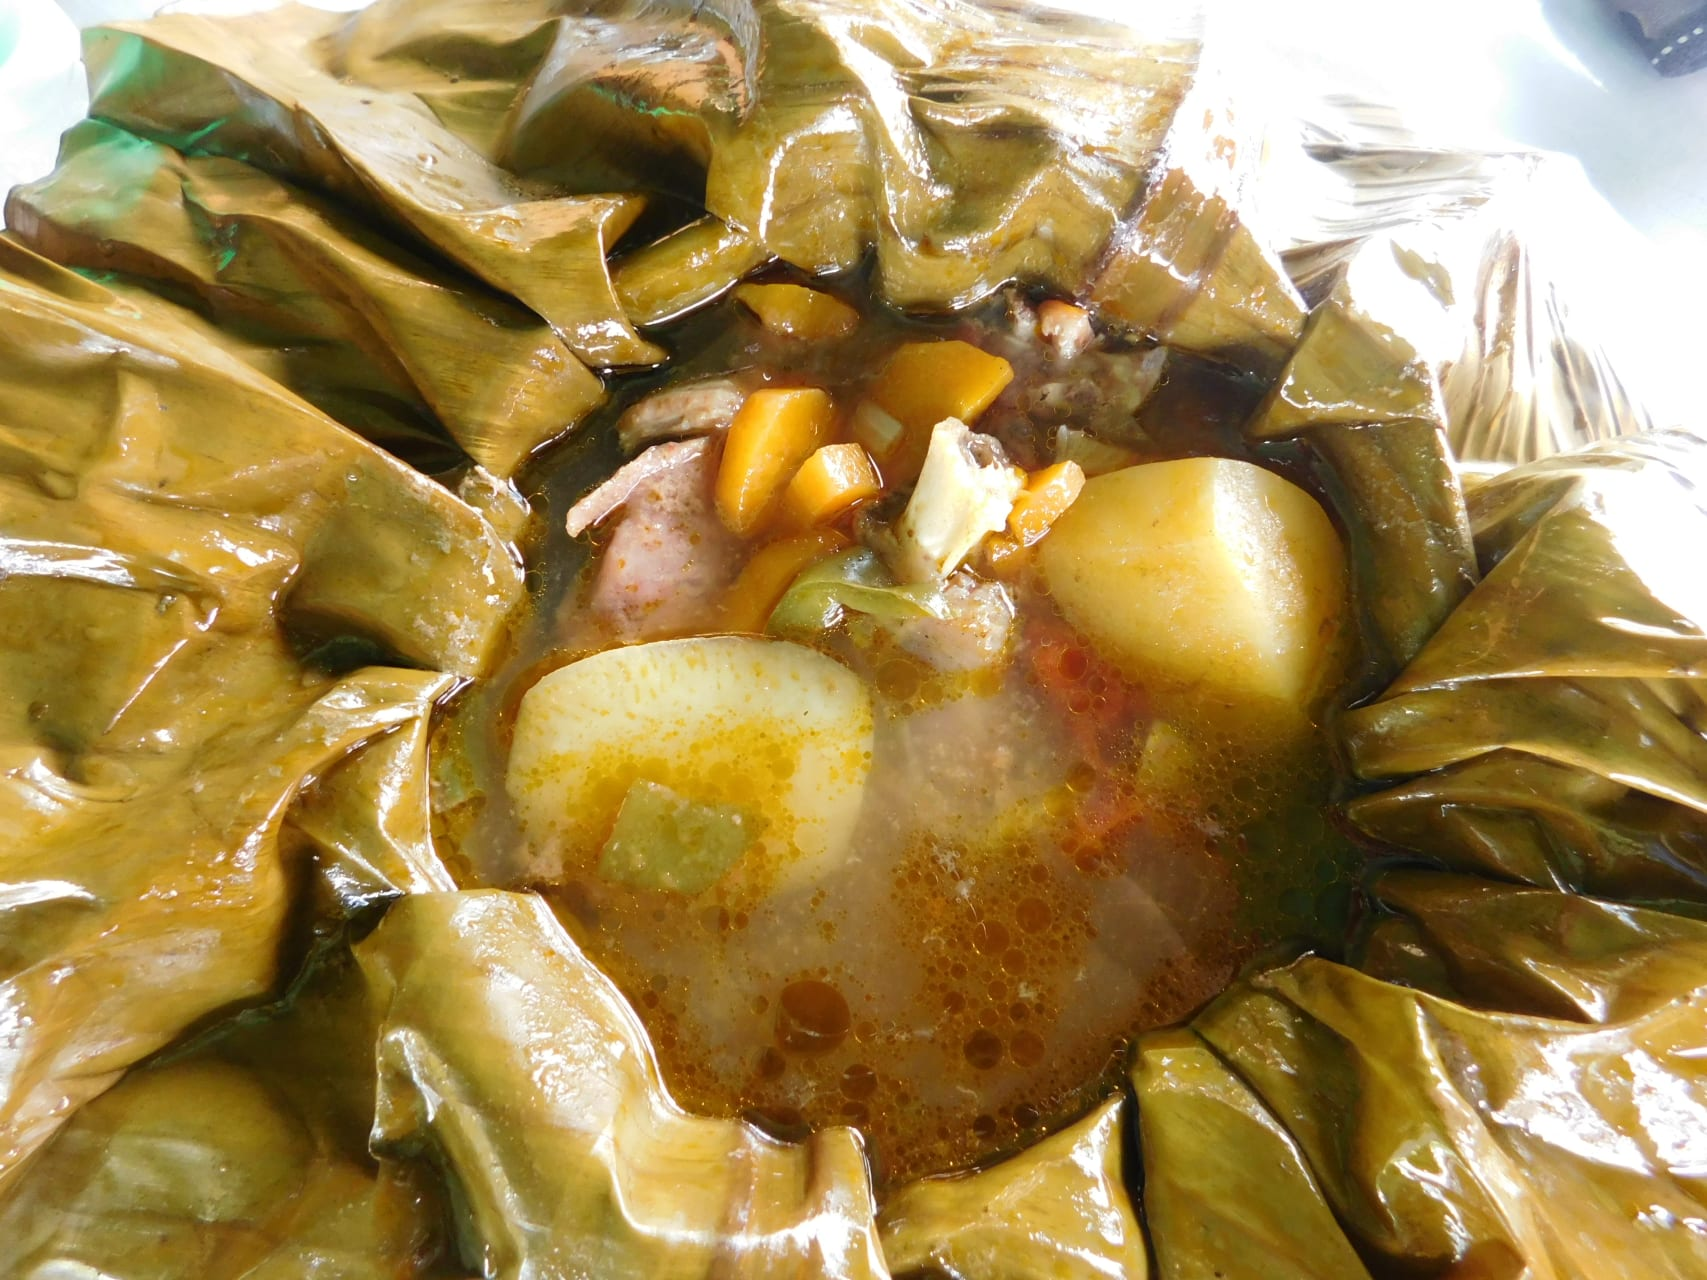 Kampala - My Luwombo!: Uganda's Party Favourite Cuisine Dish